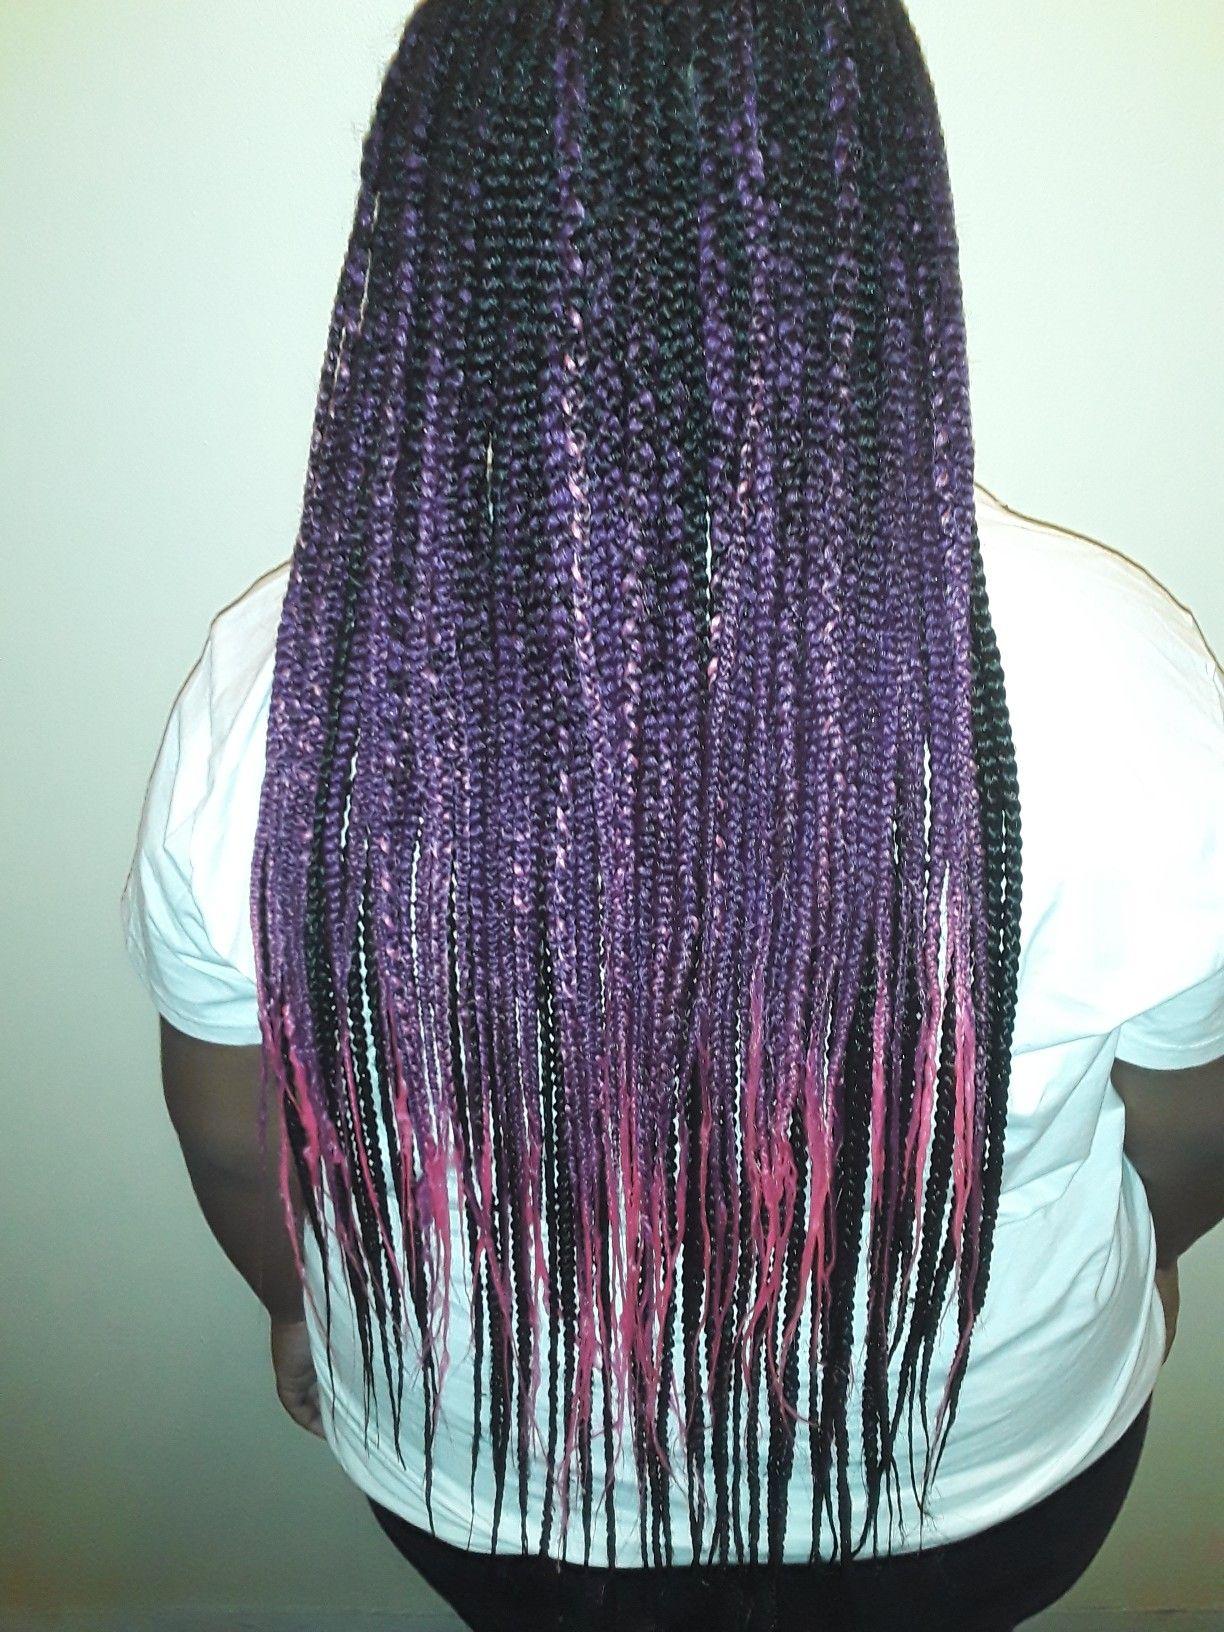 Done with antibacterial rainbow braid Rainbow braids